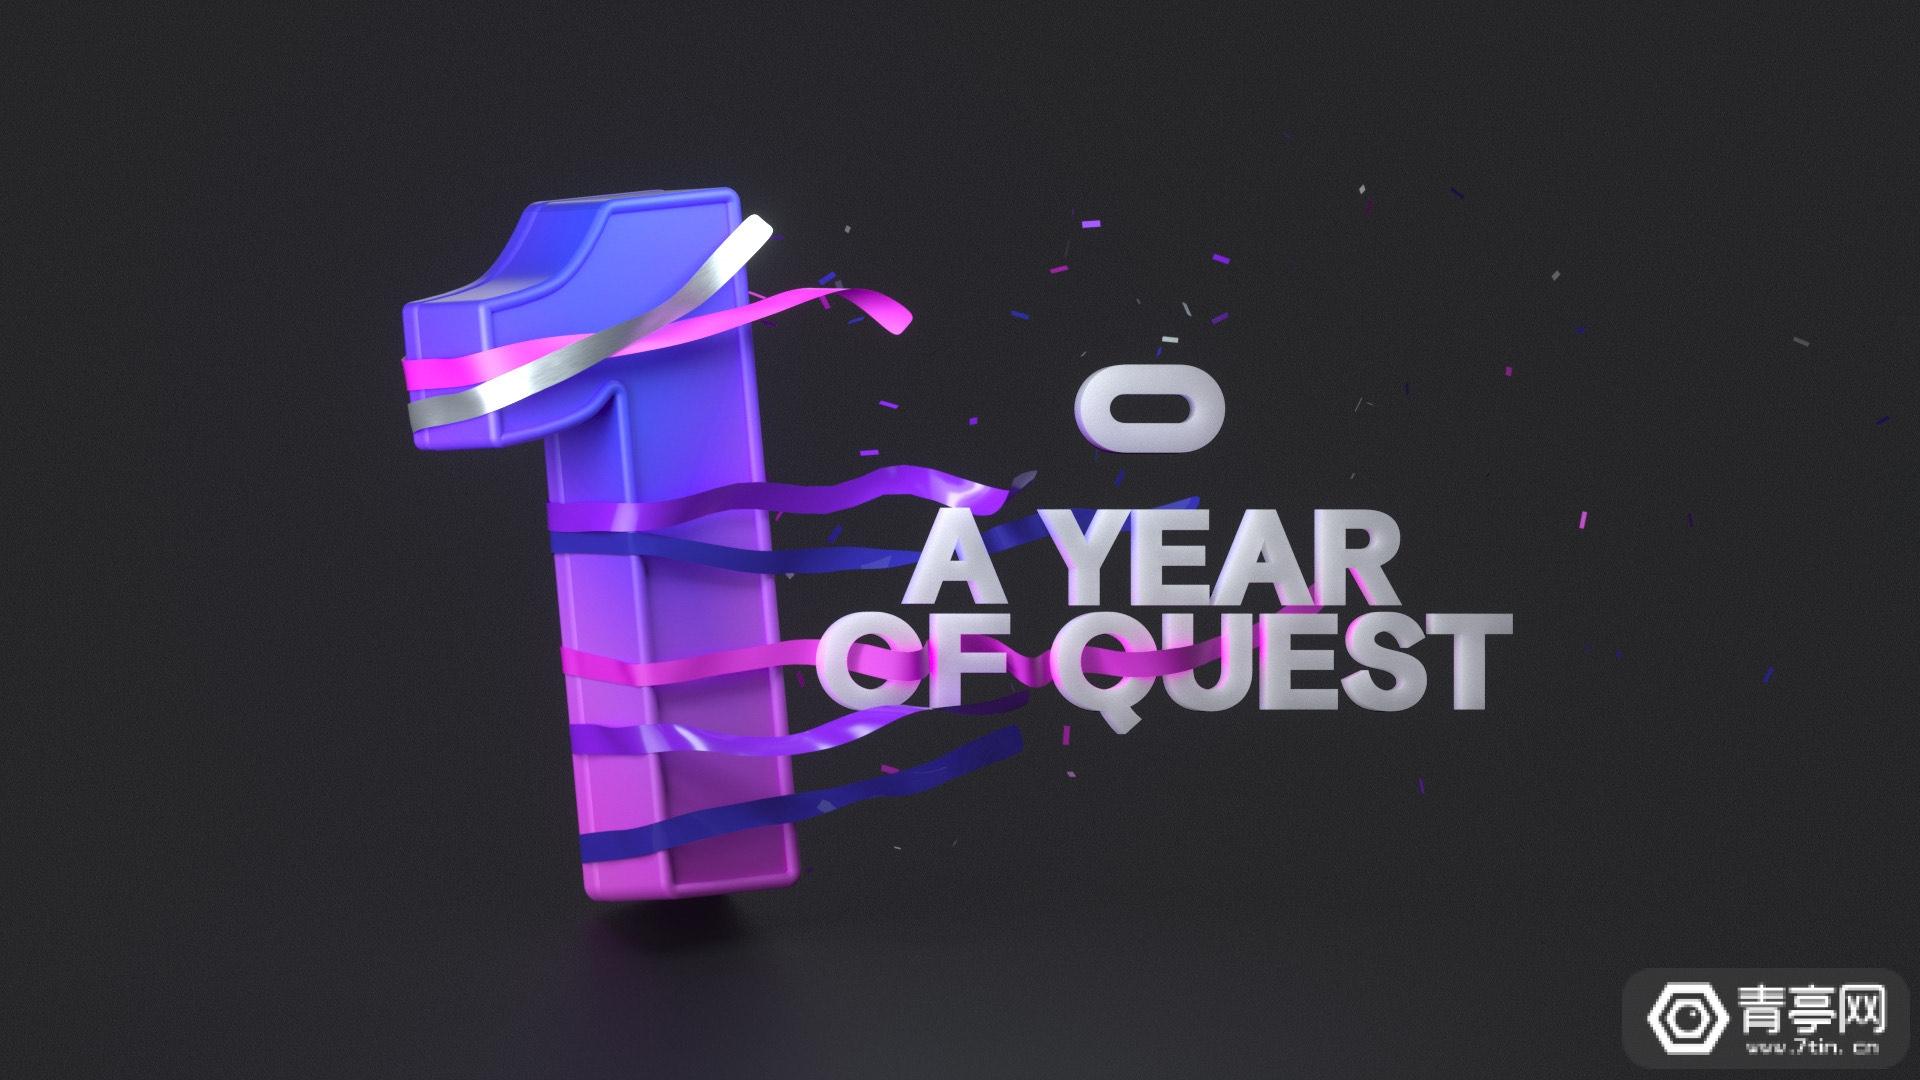 Oculus Quest一周年:交易额破1亿美元,手势功能开放